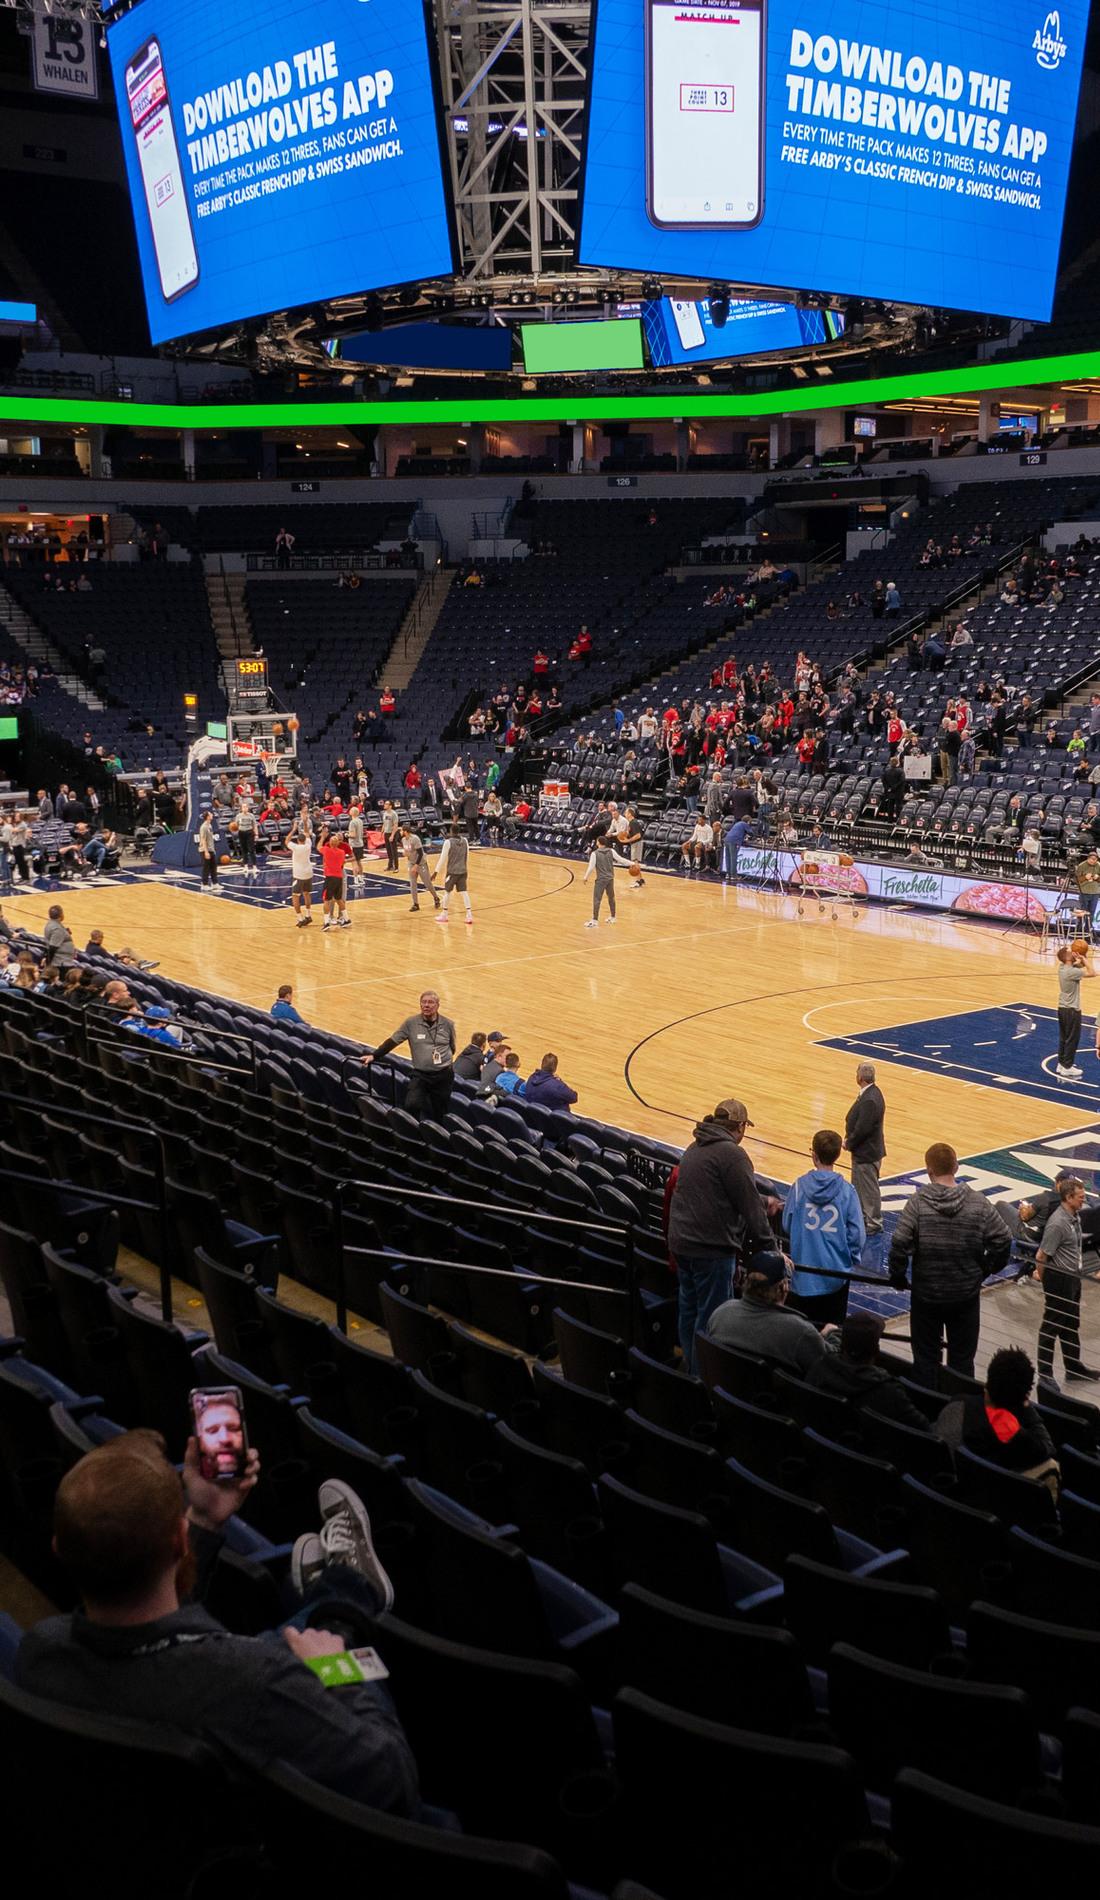 A Minnesota Timberwolves live event